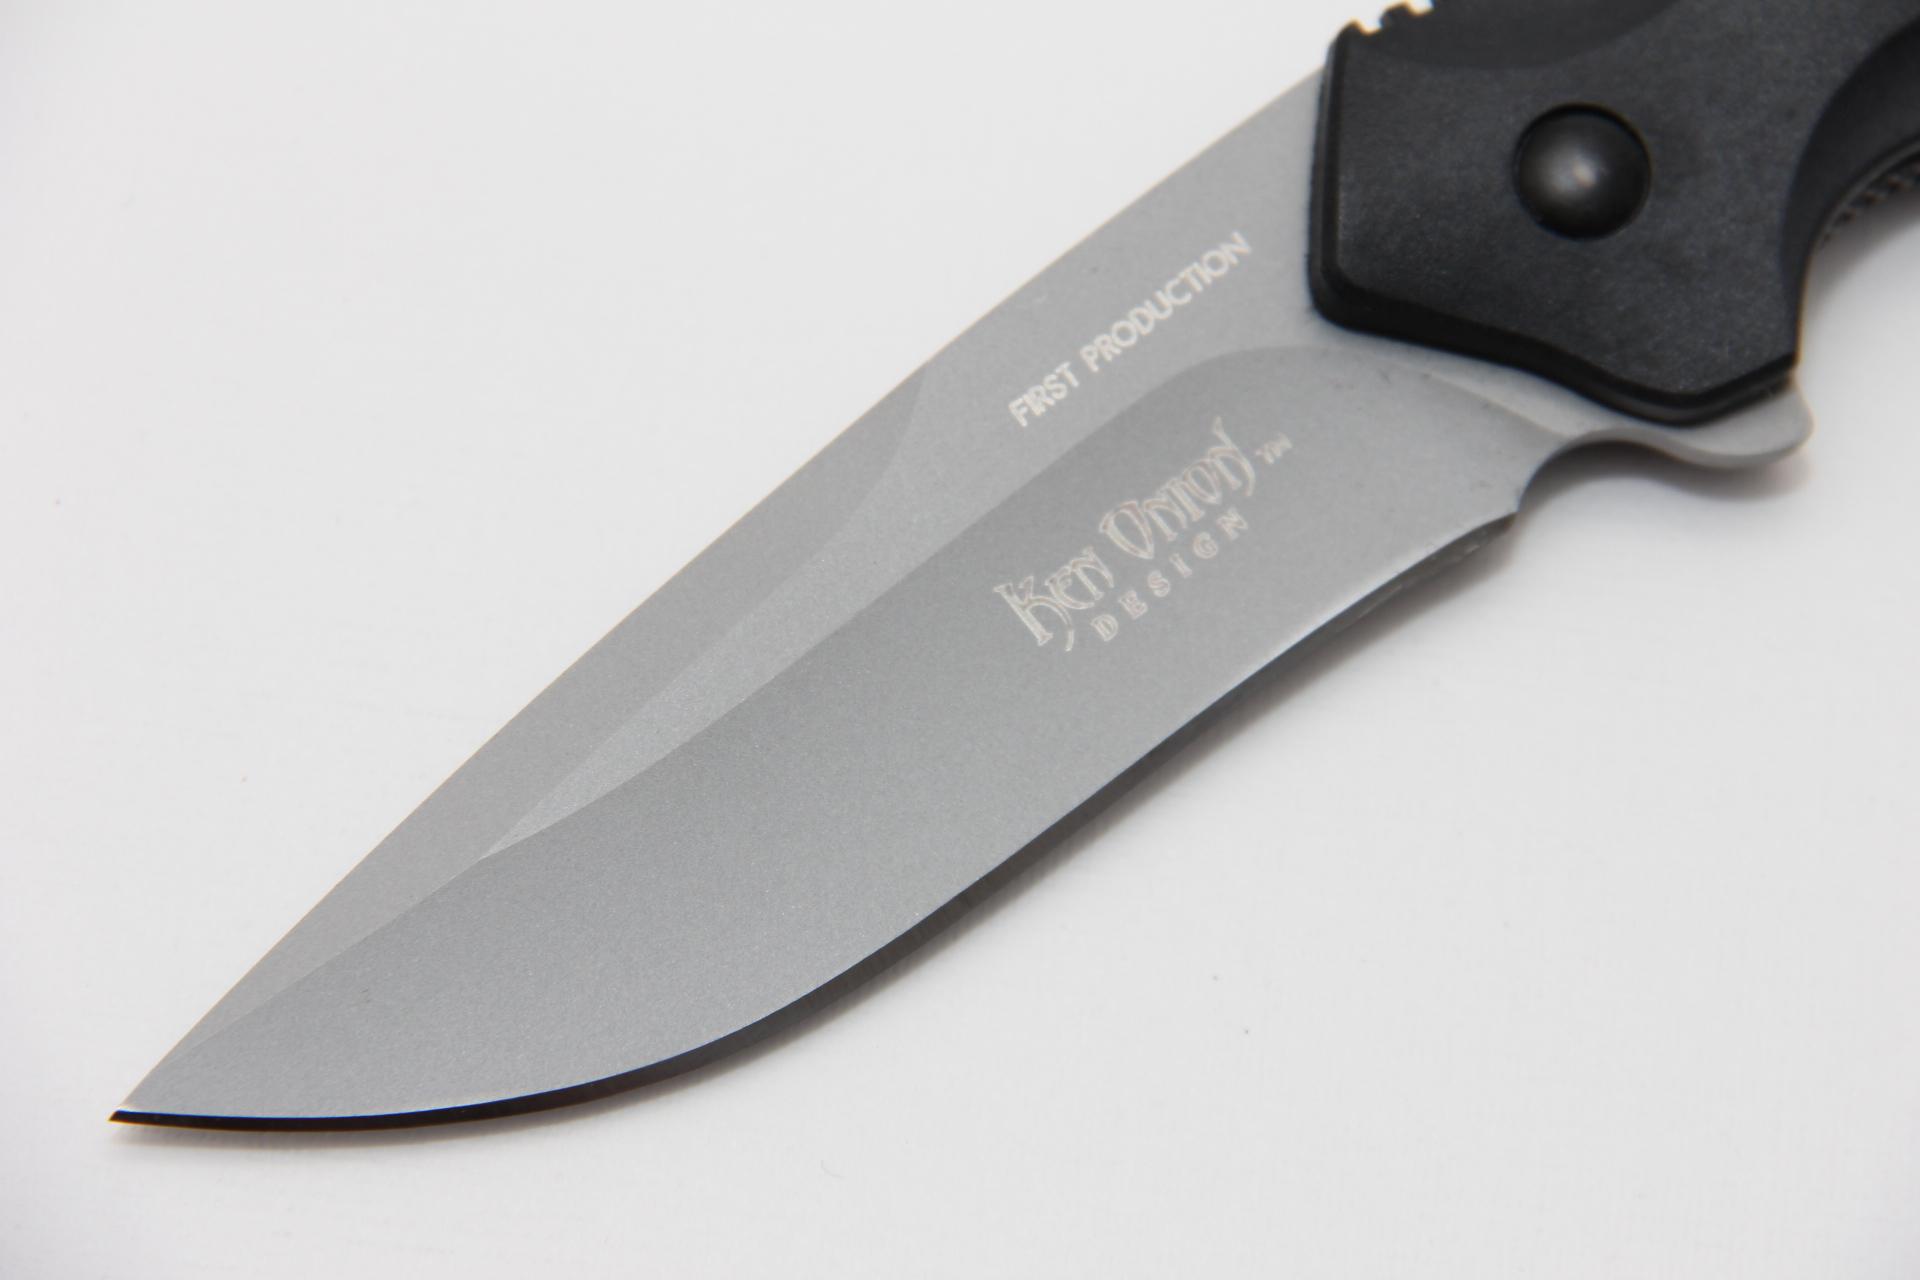 Нож CRKT K480KKP Onion Shenanigan - фотография